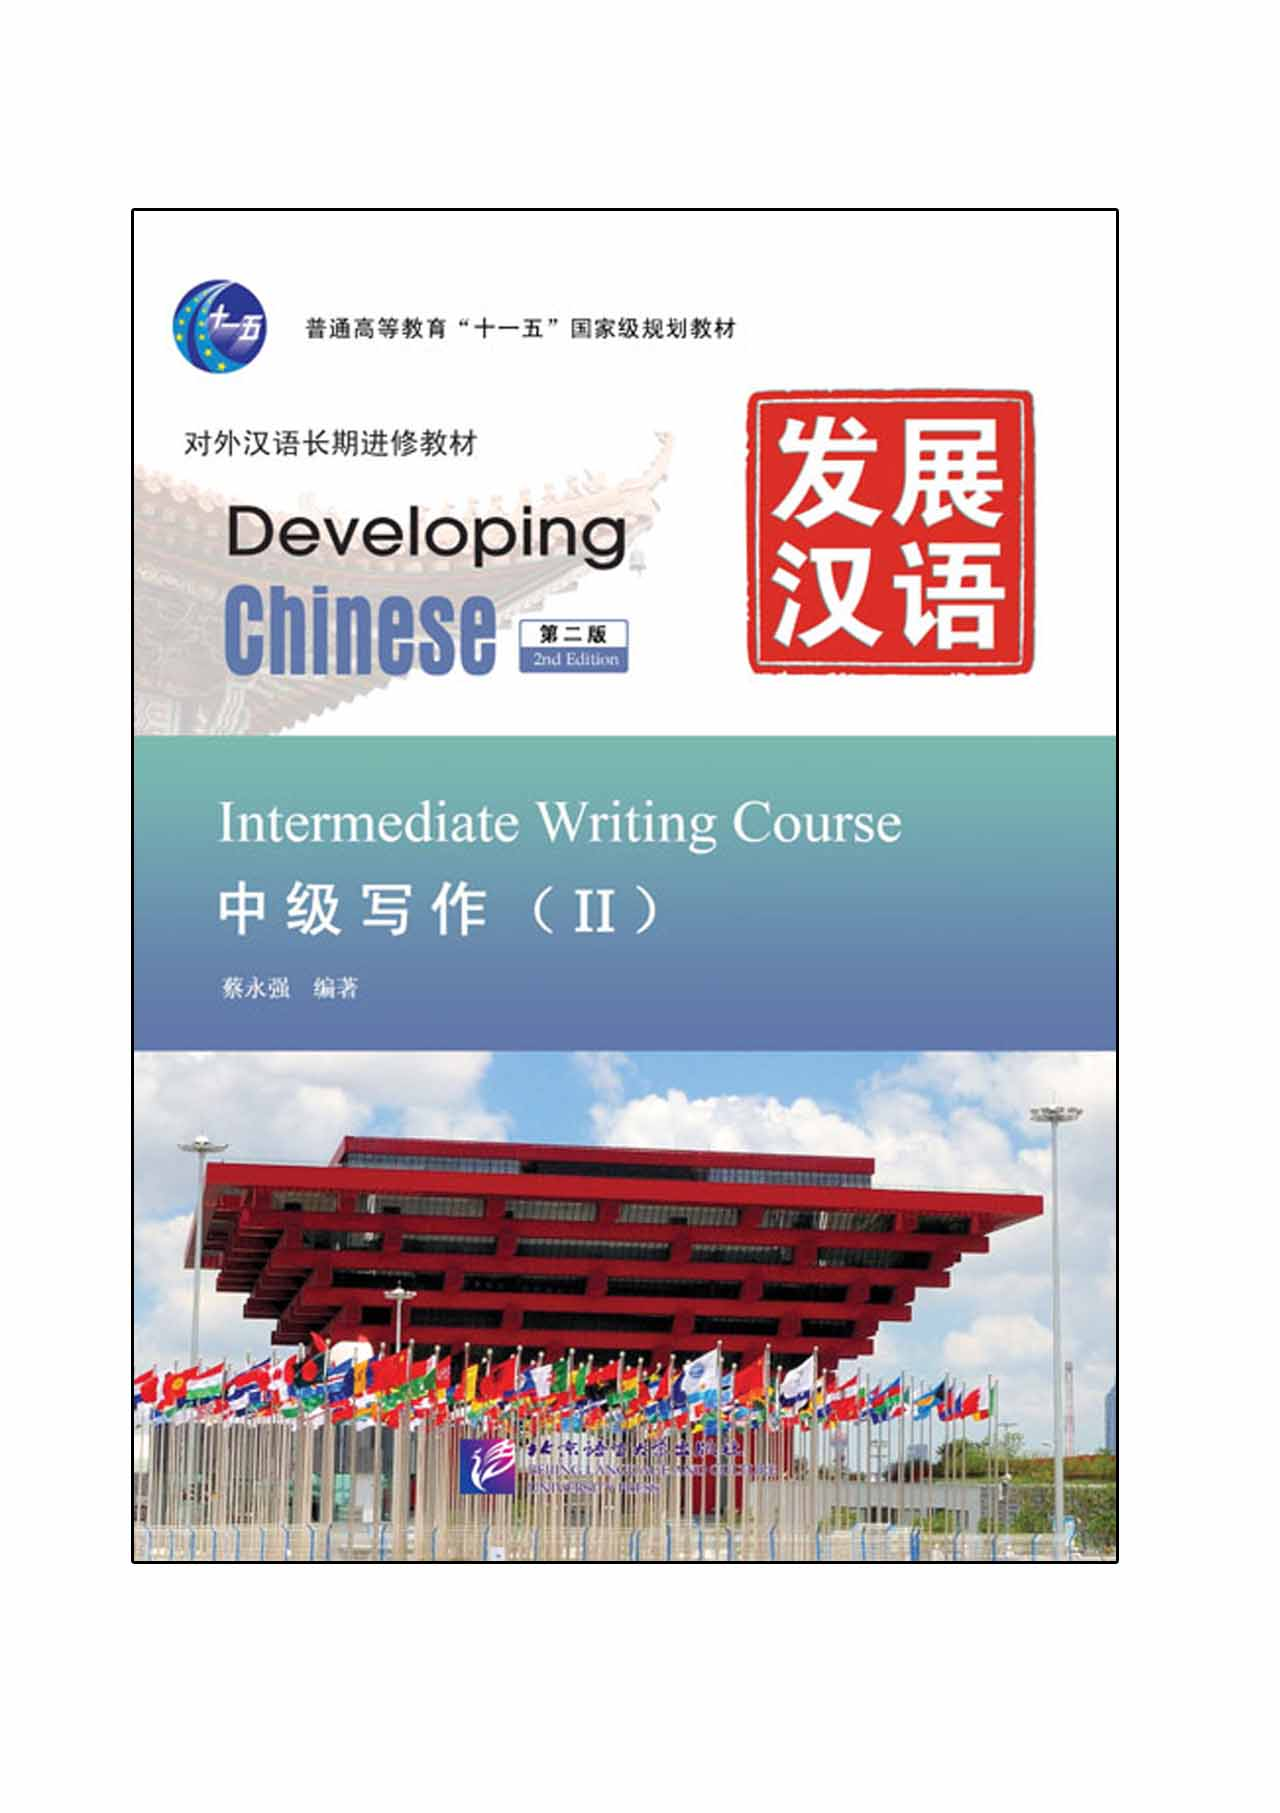 Developing Chinese (2nd Edition) Intermediate Writing Course Ⅱ发展汉语(第2版)中级写作(Ⅱ)